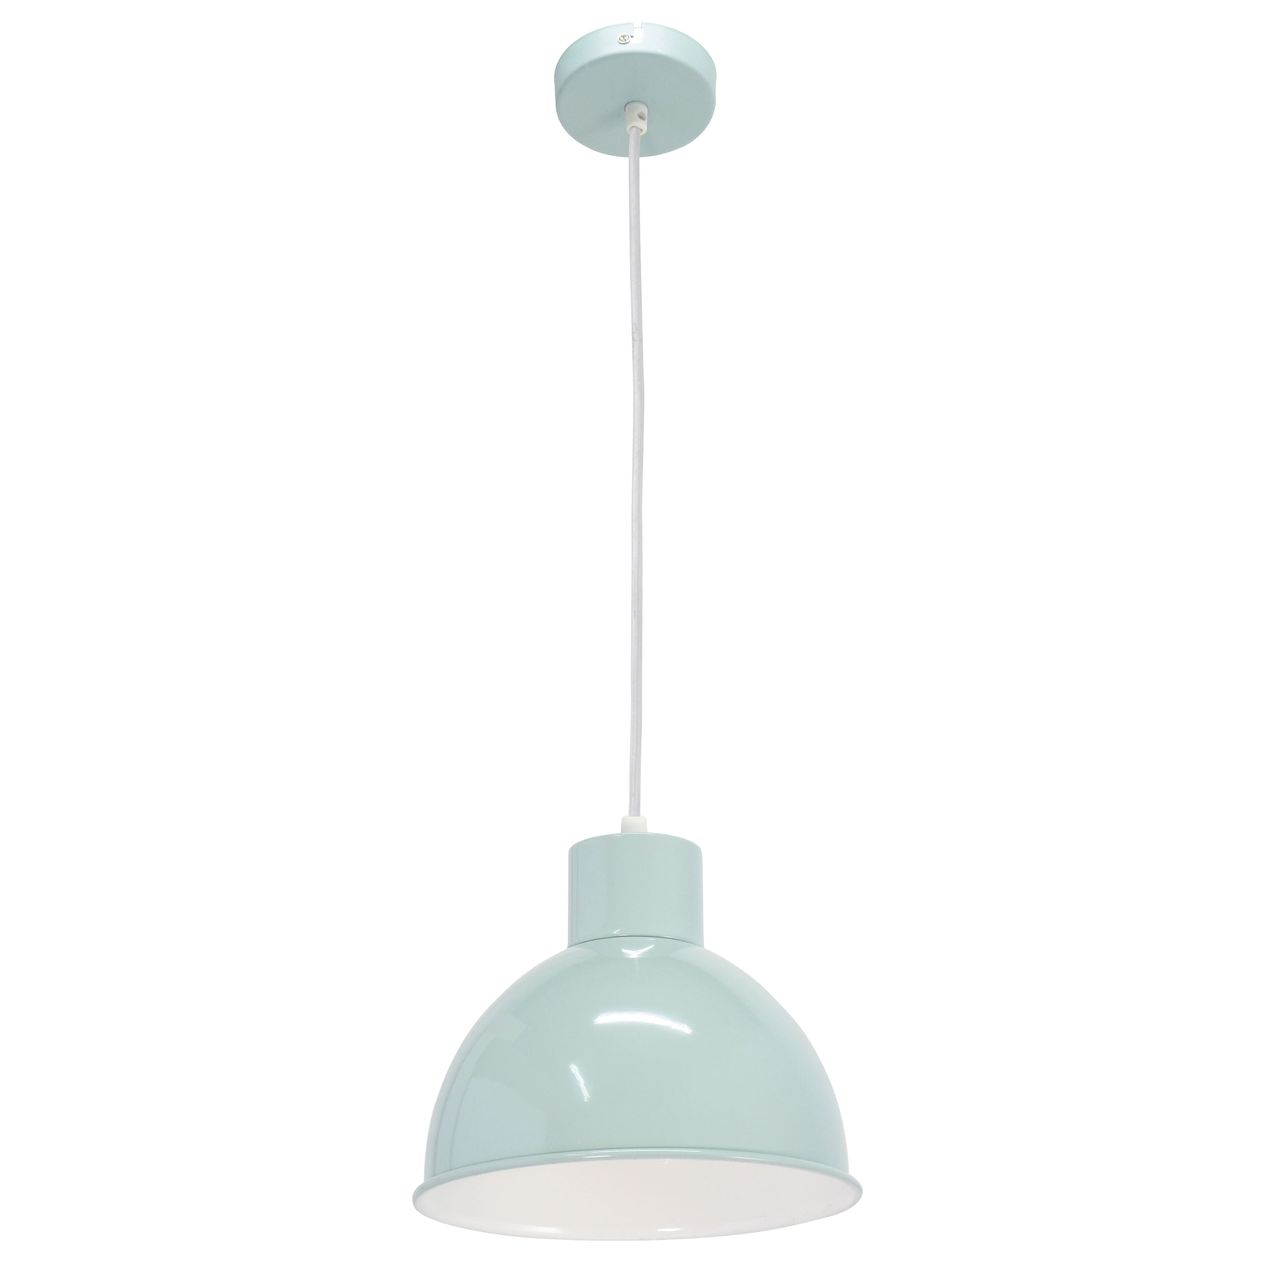 Подвесной светильник Eglo Vintage 49239 абажур eglo vintage 49659